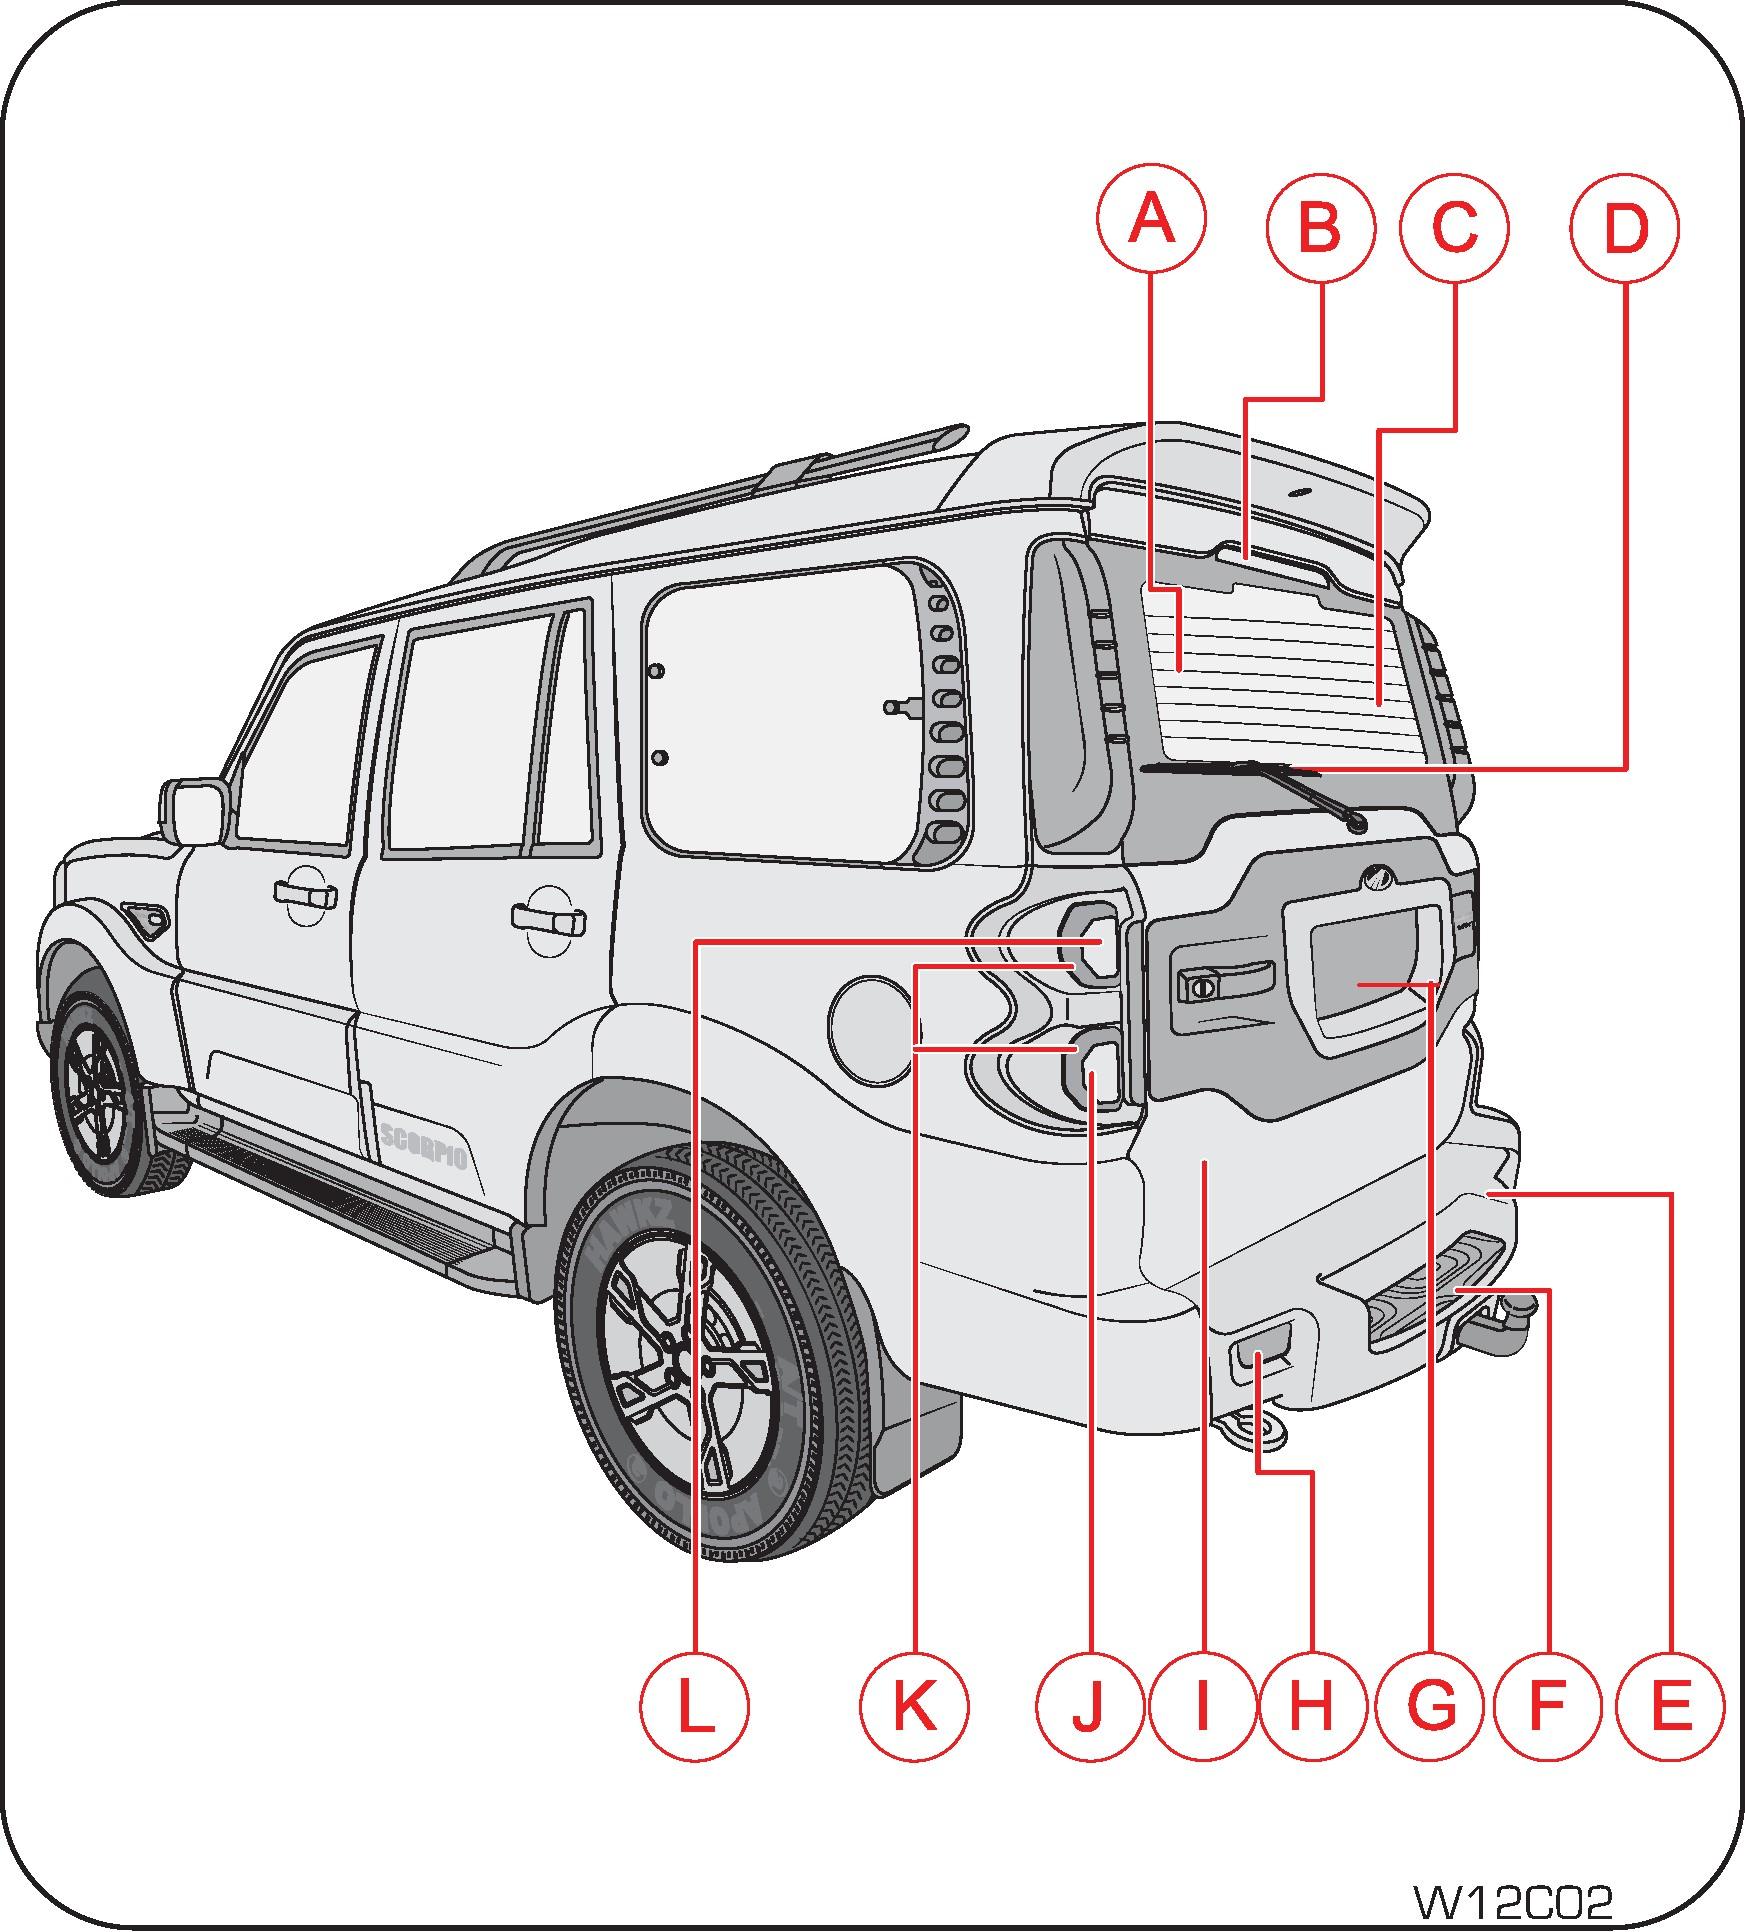 Names Of Car Parts Diagram Mahindra Owners Manual – My Wiring DIagram